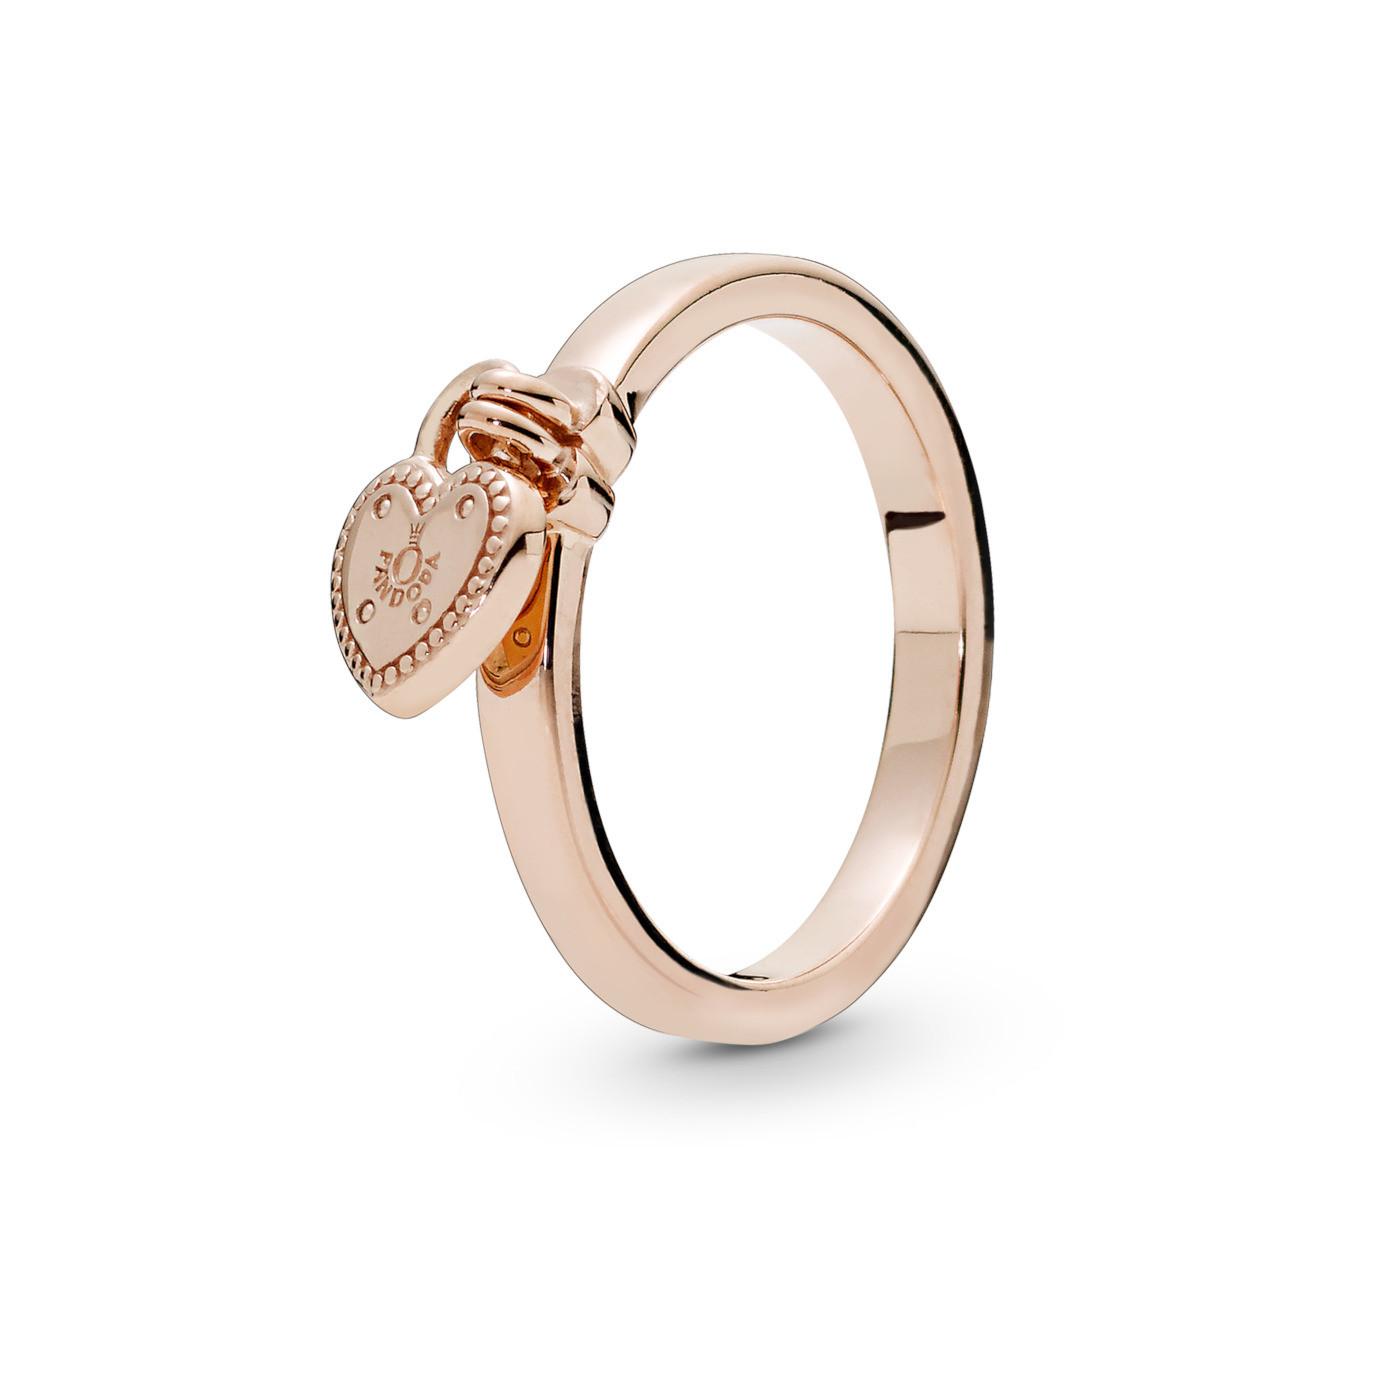 59f441907 Pandora Stories Ring 186571 - Jewelry